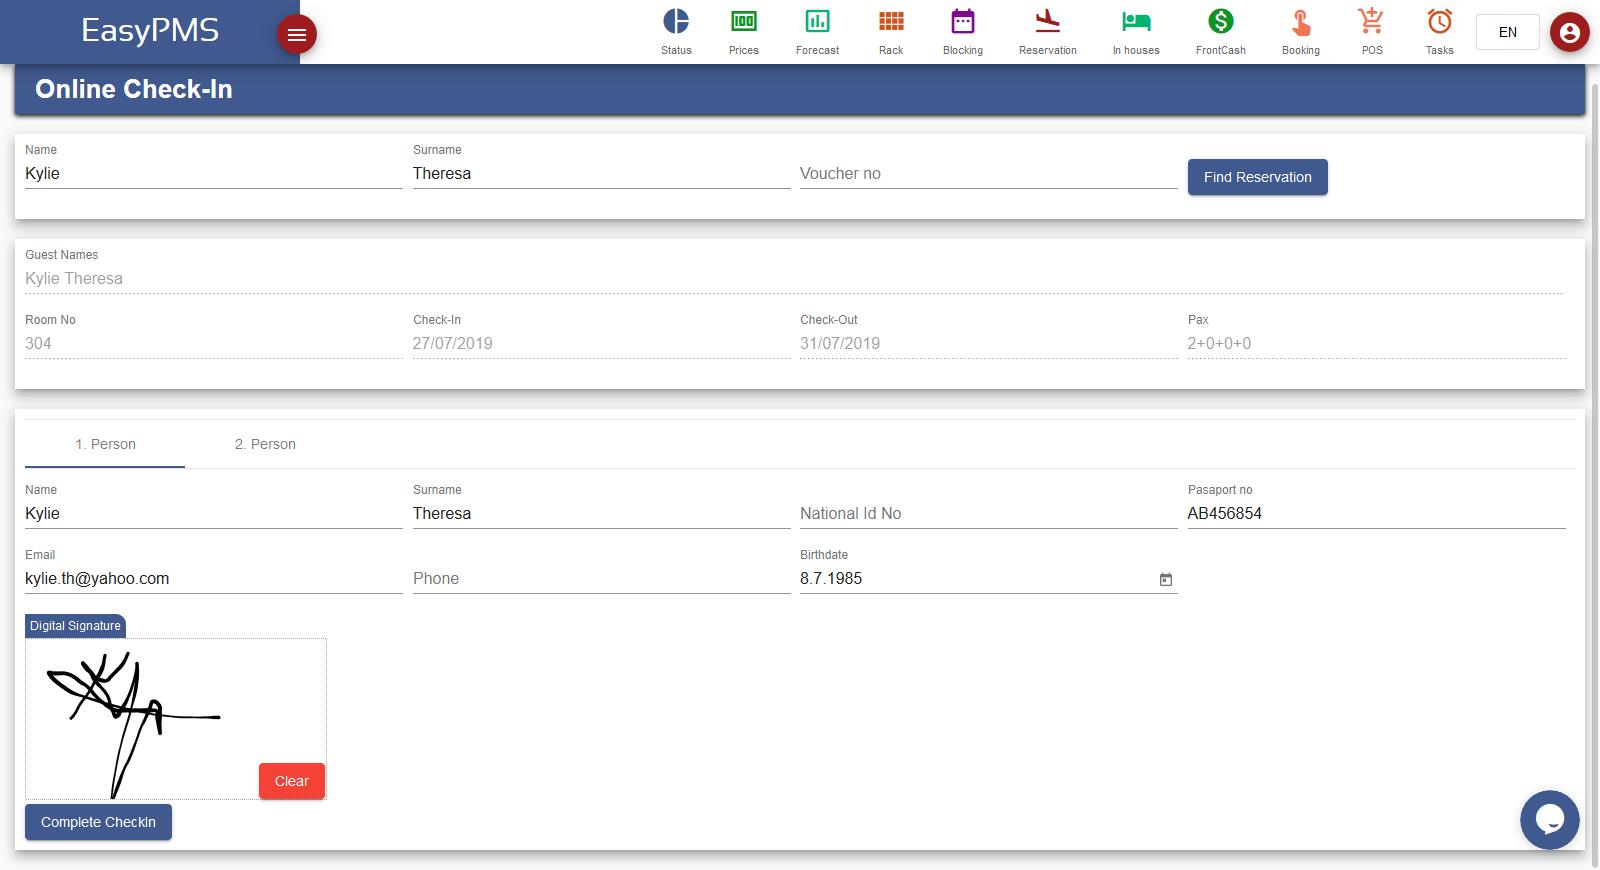 easypms hotel management online checkin